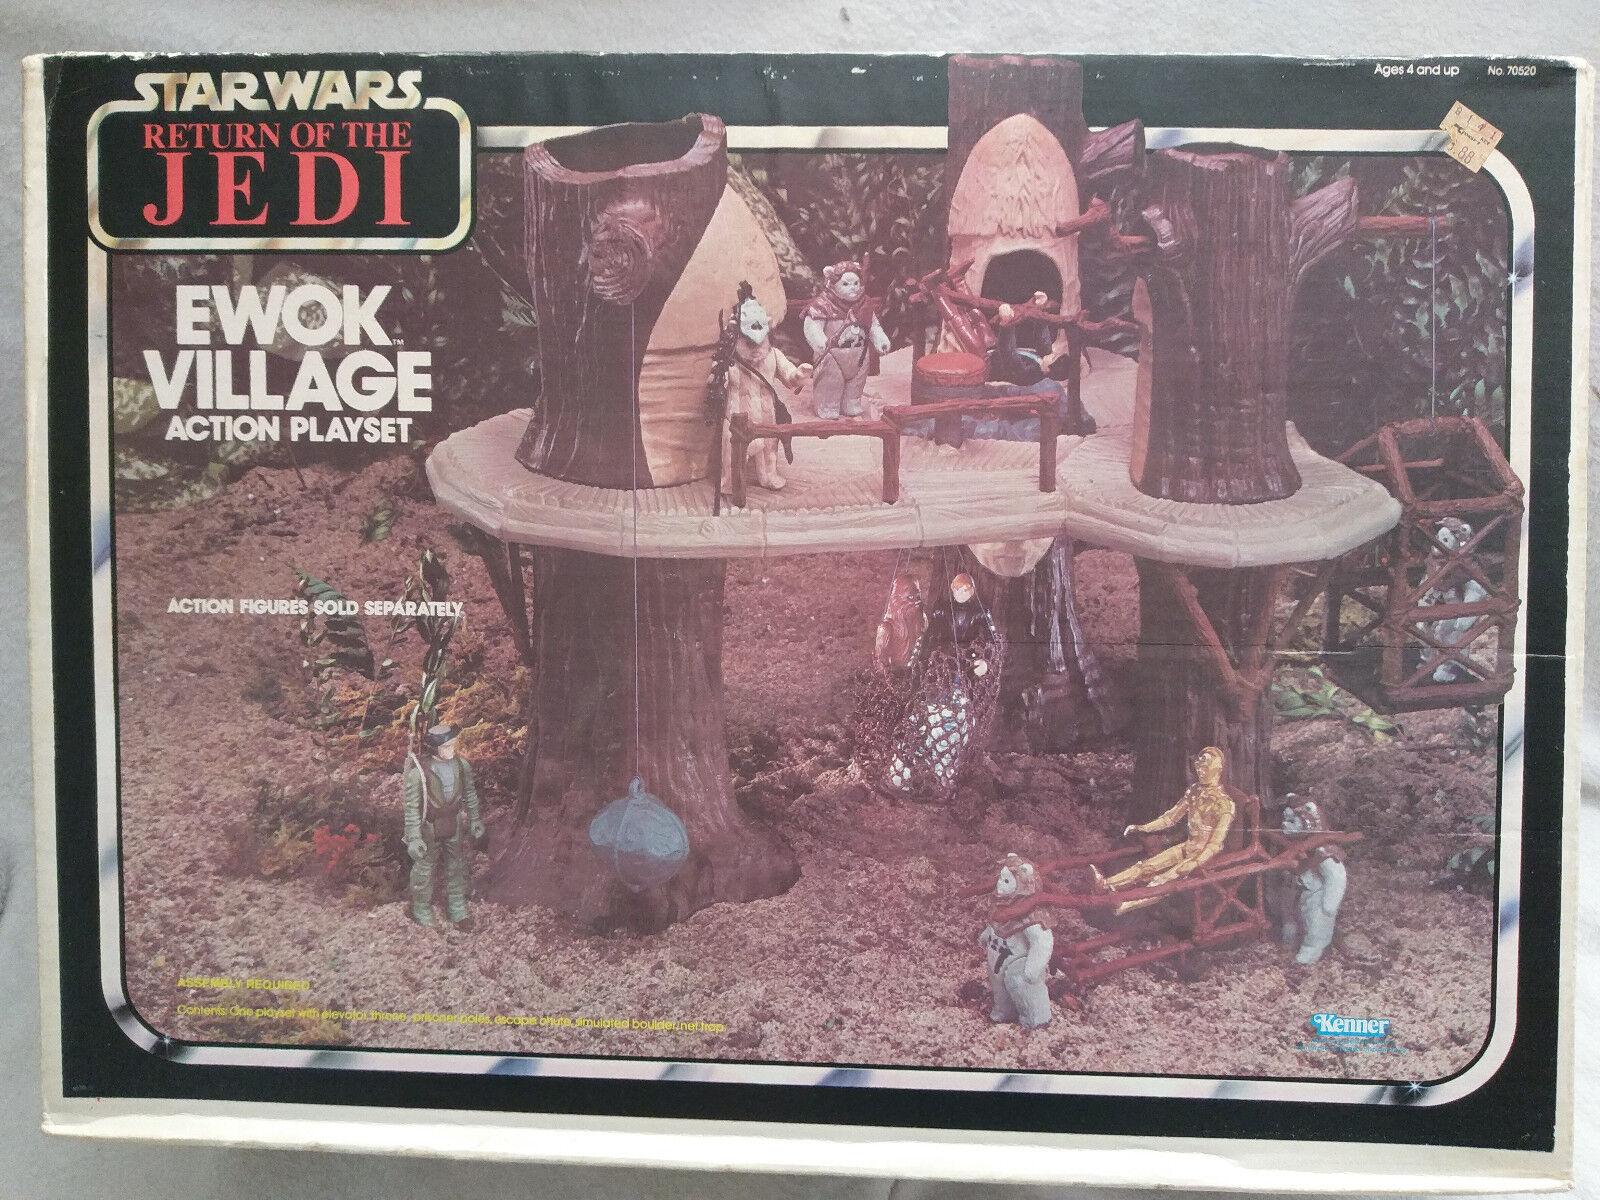 Star Wars ROTJ Ewok Village 1983